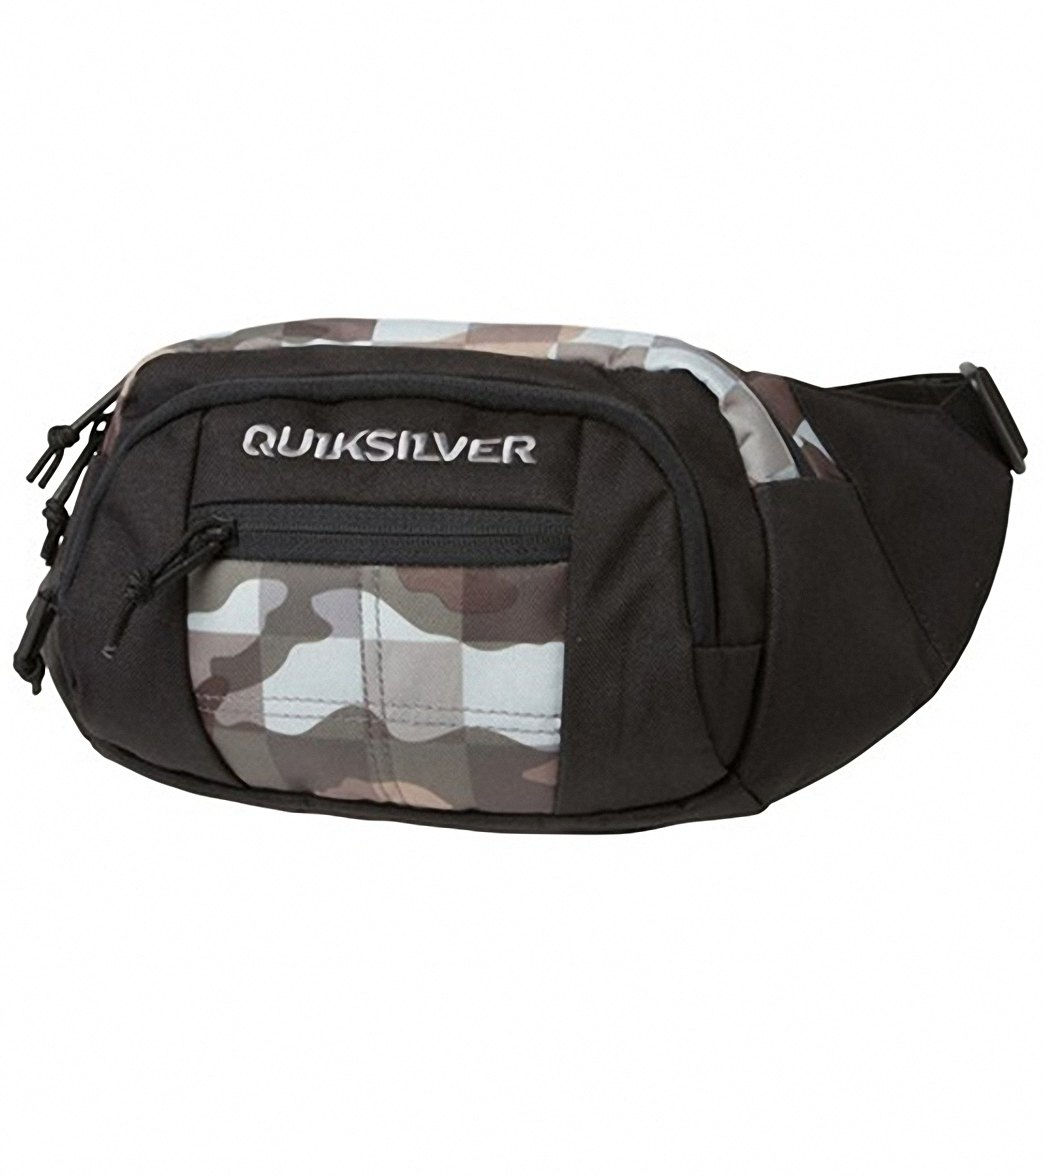 Quiksilver Men's Traveler Waist Pack at SwimOutlet.